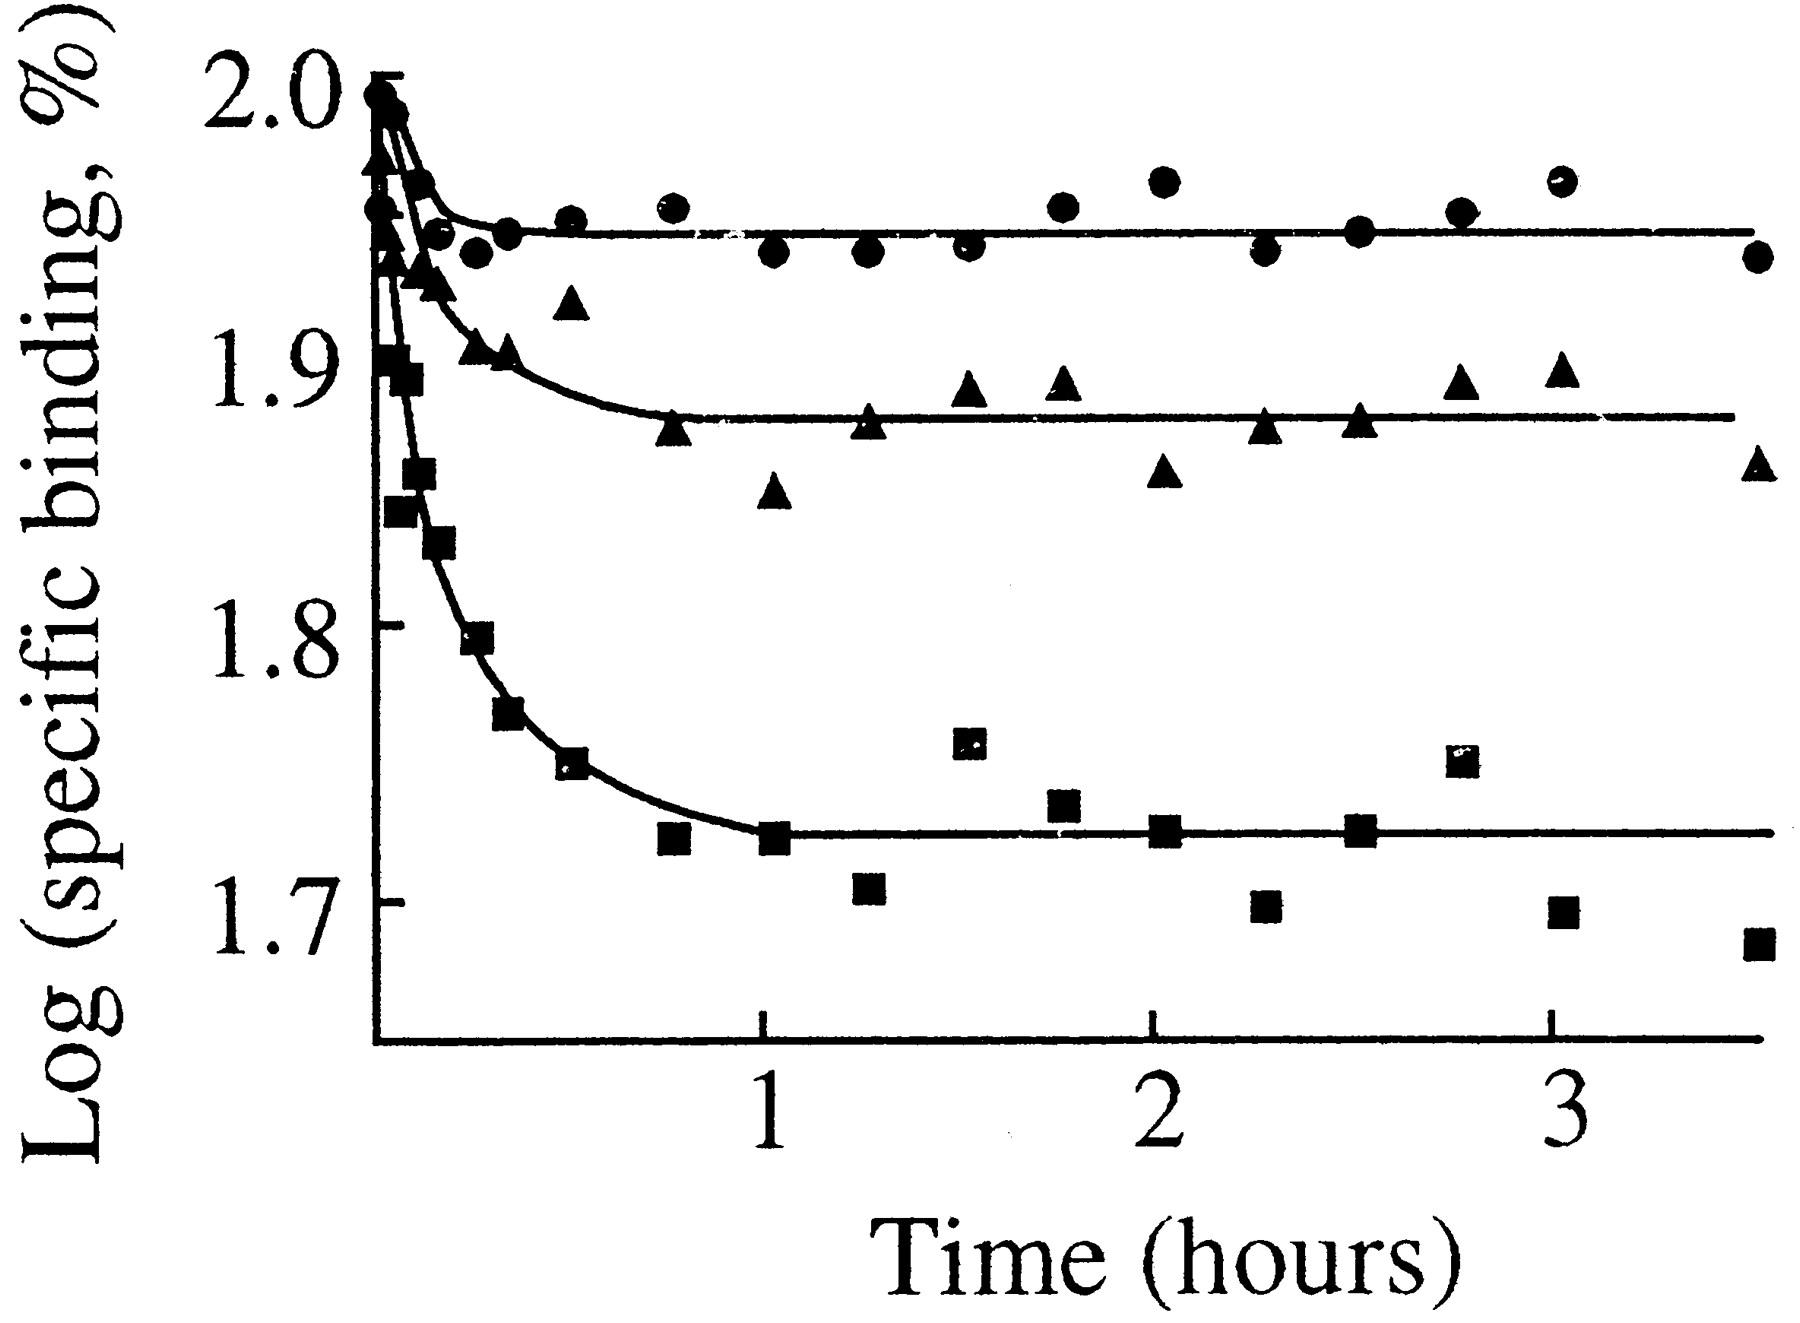 Aspirin and Sodium Salicylate Inhibit Endothelin ETA